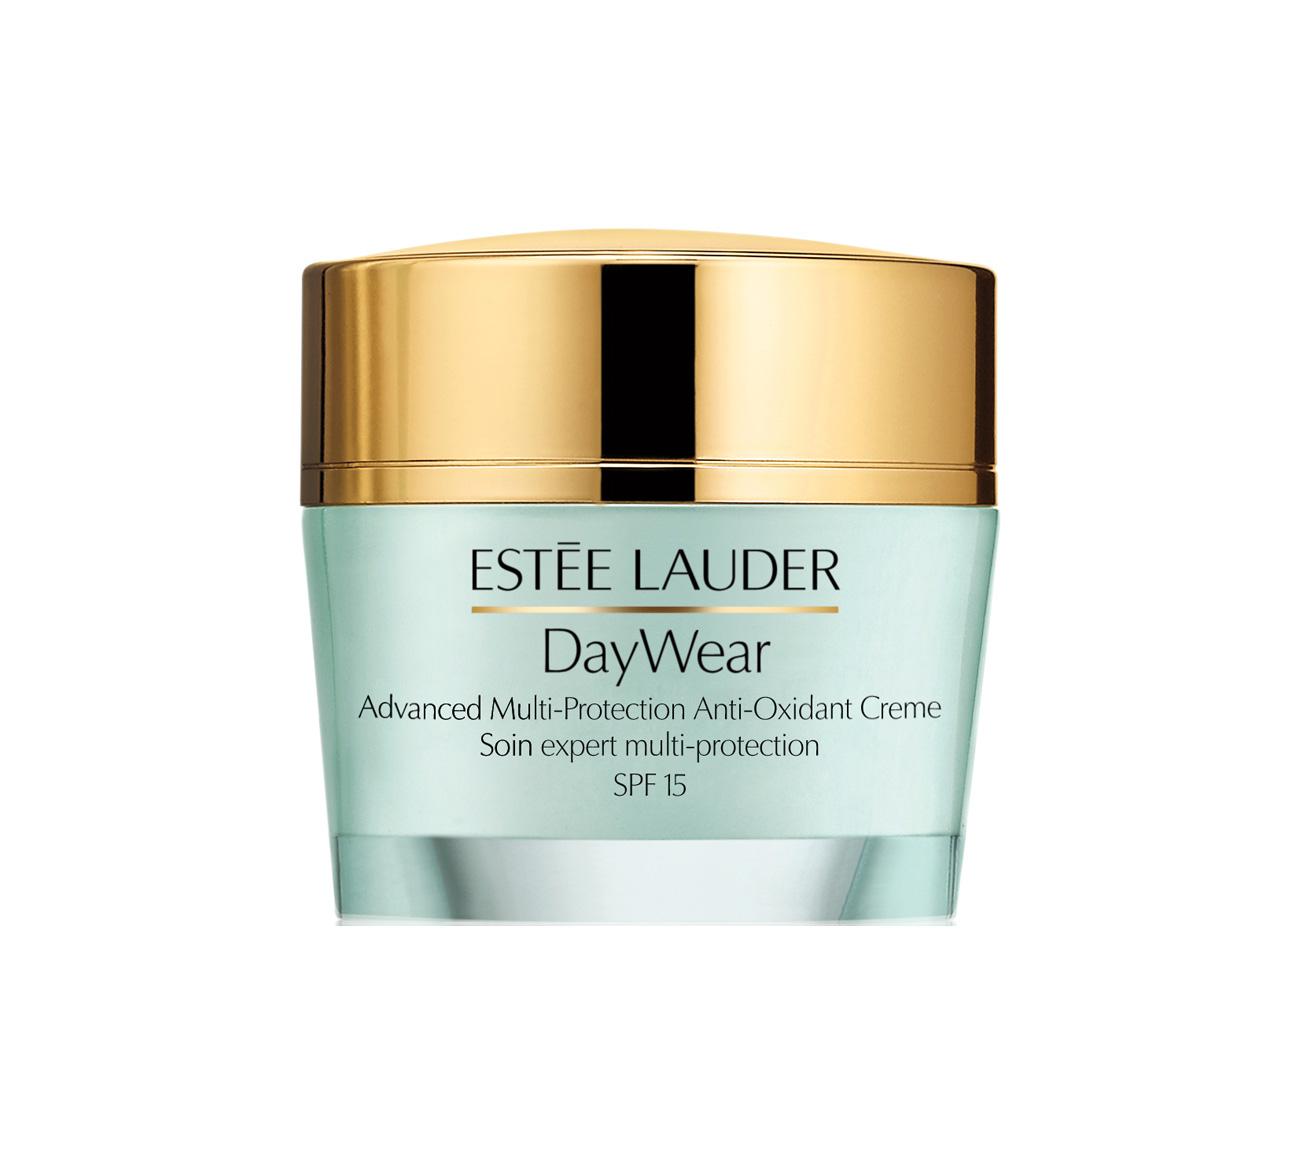 Estée Lauder - DayWear Advanced Multi-Protection Anti-Oxidant Creme SPF 15 Dry Skin 50 ml.